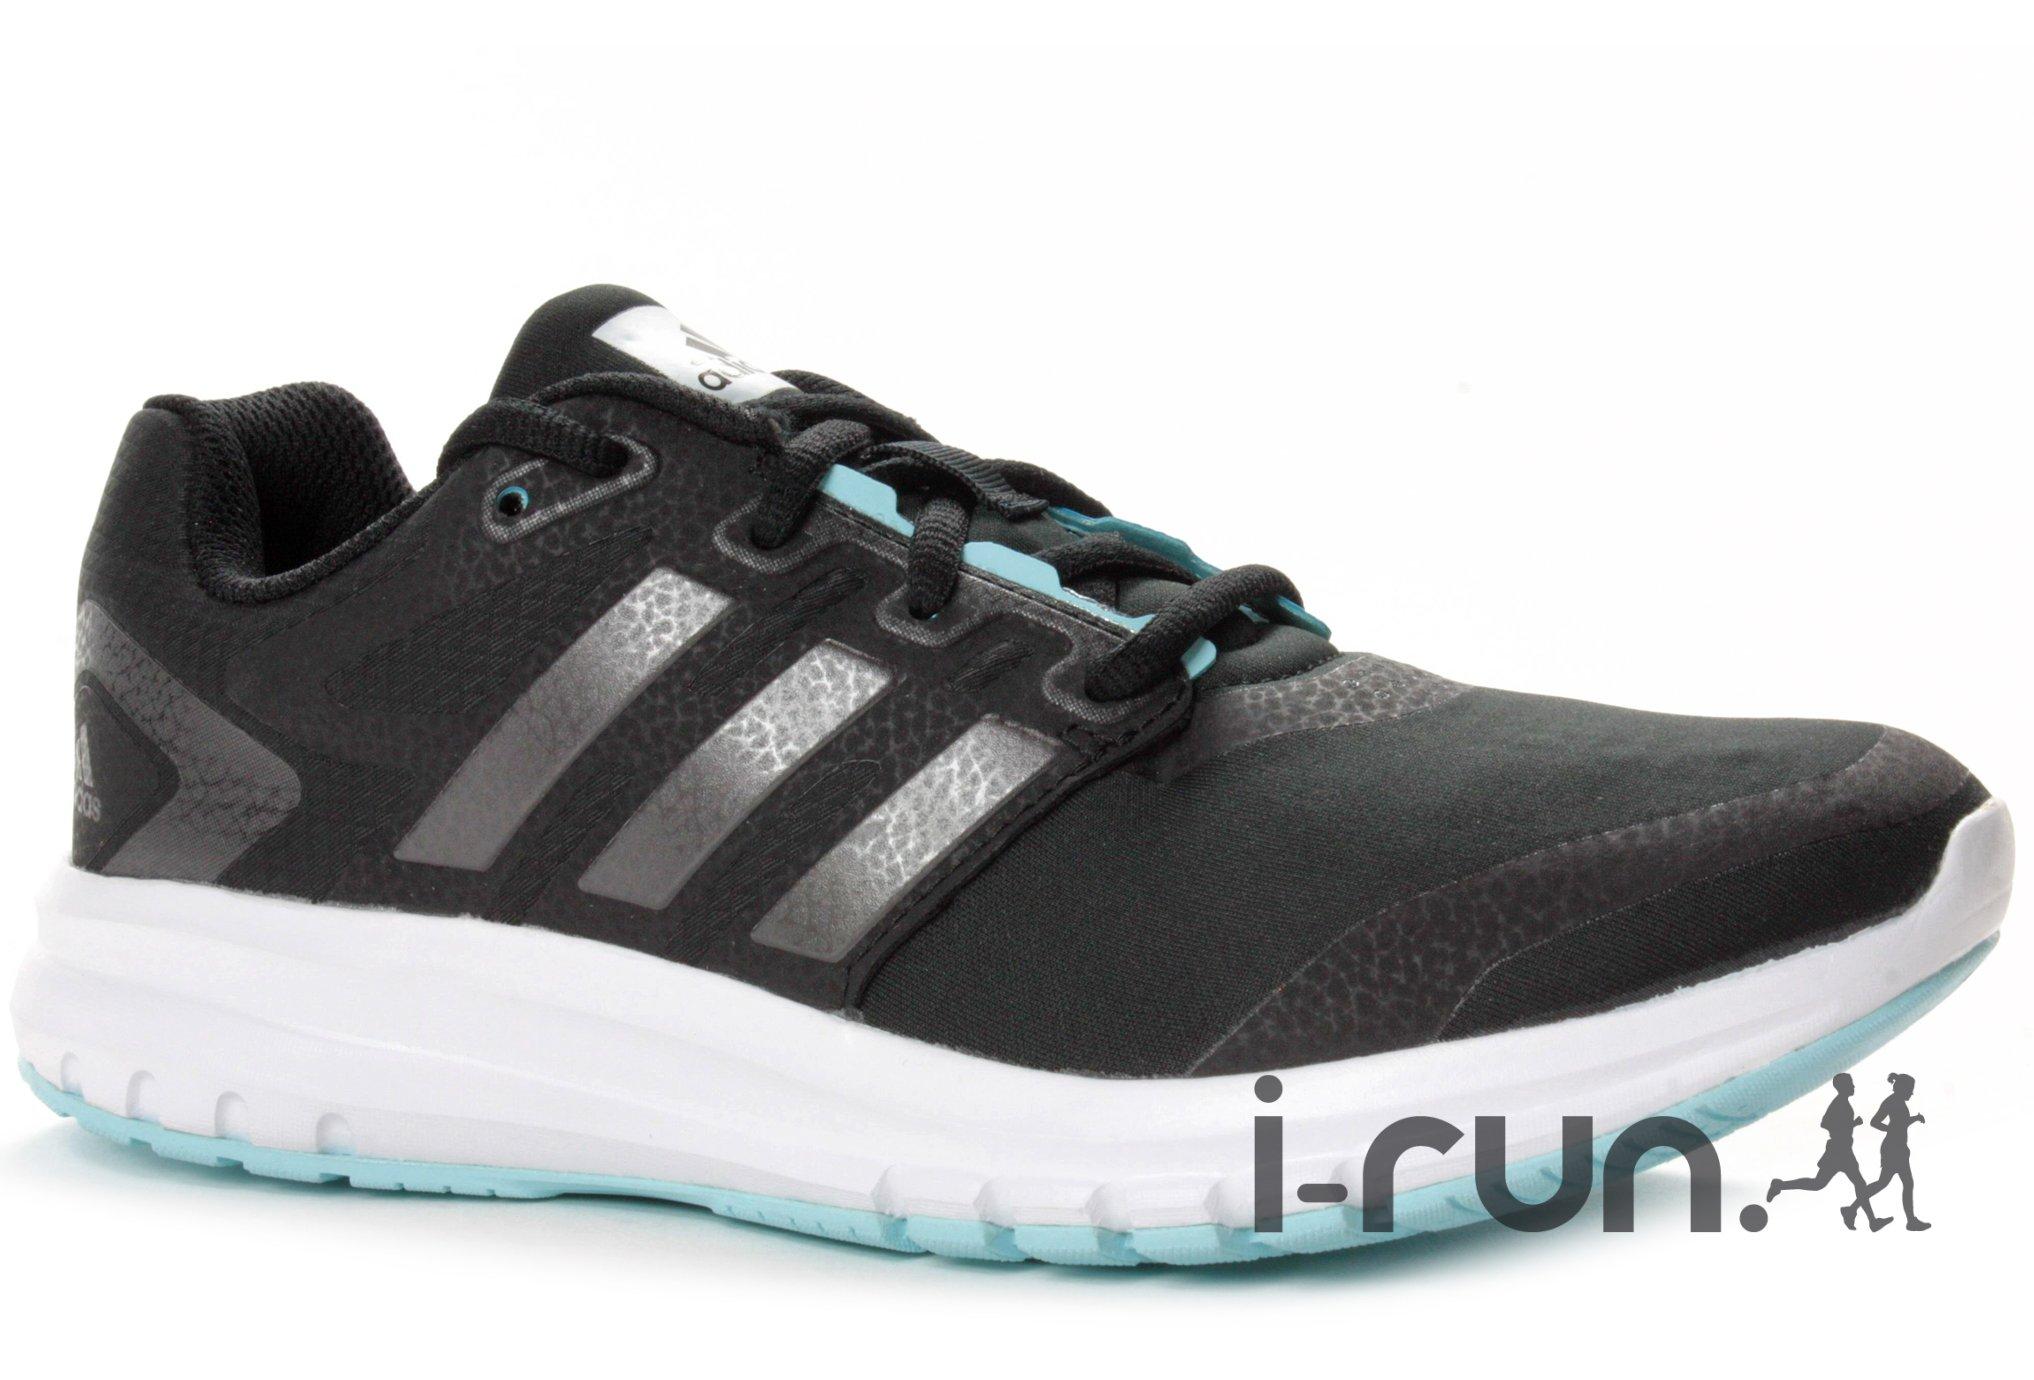 Adidas Brevard w diététique chaussures femme